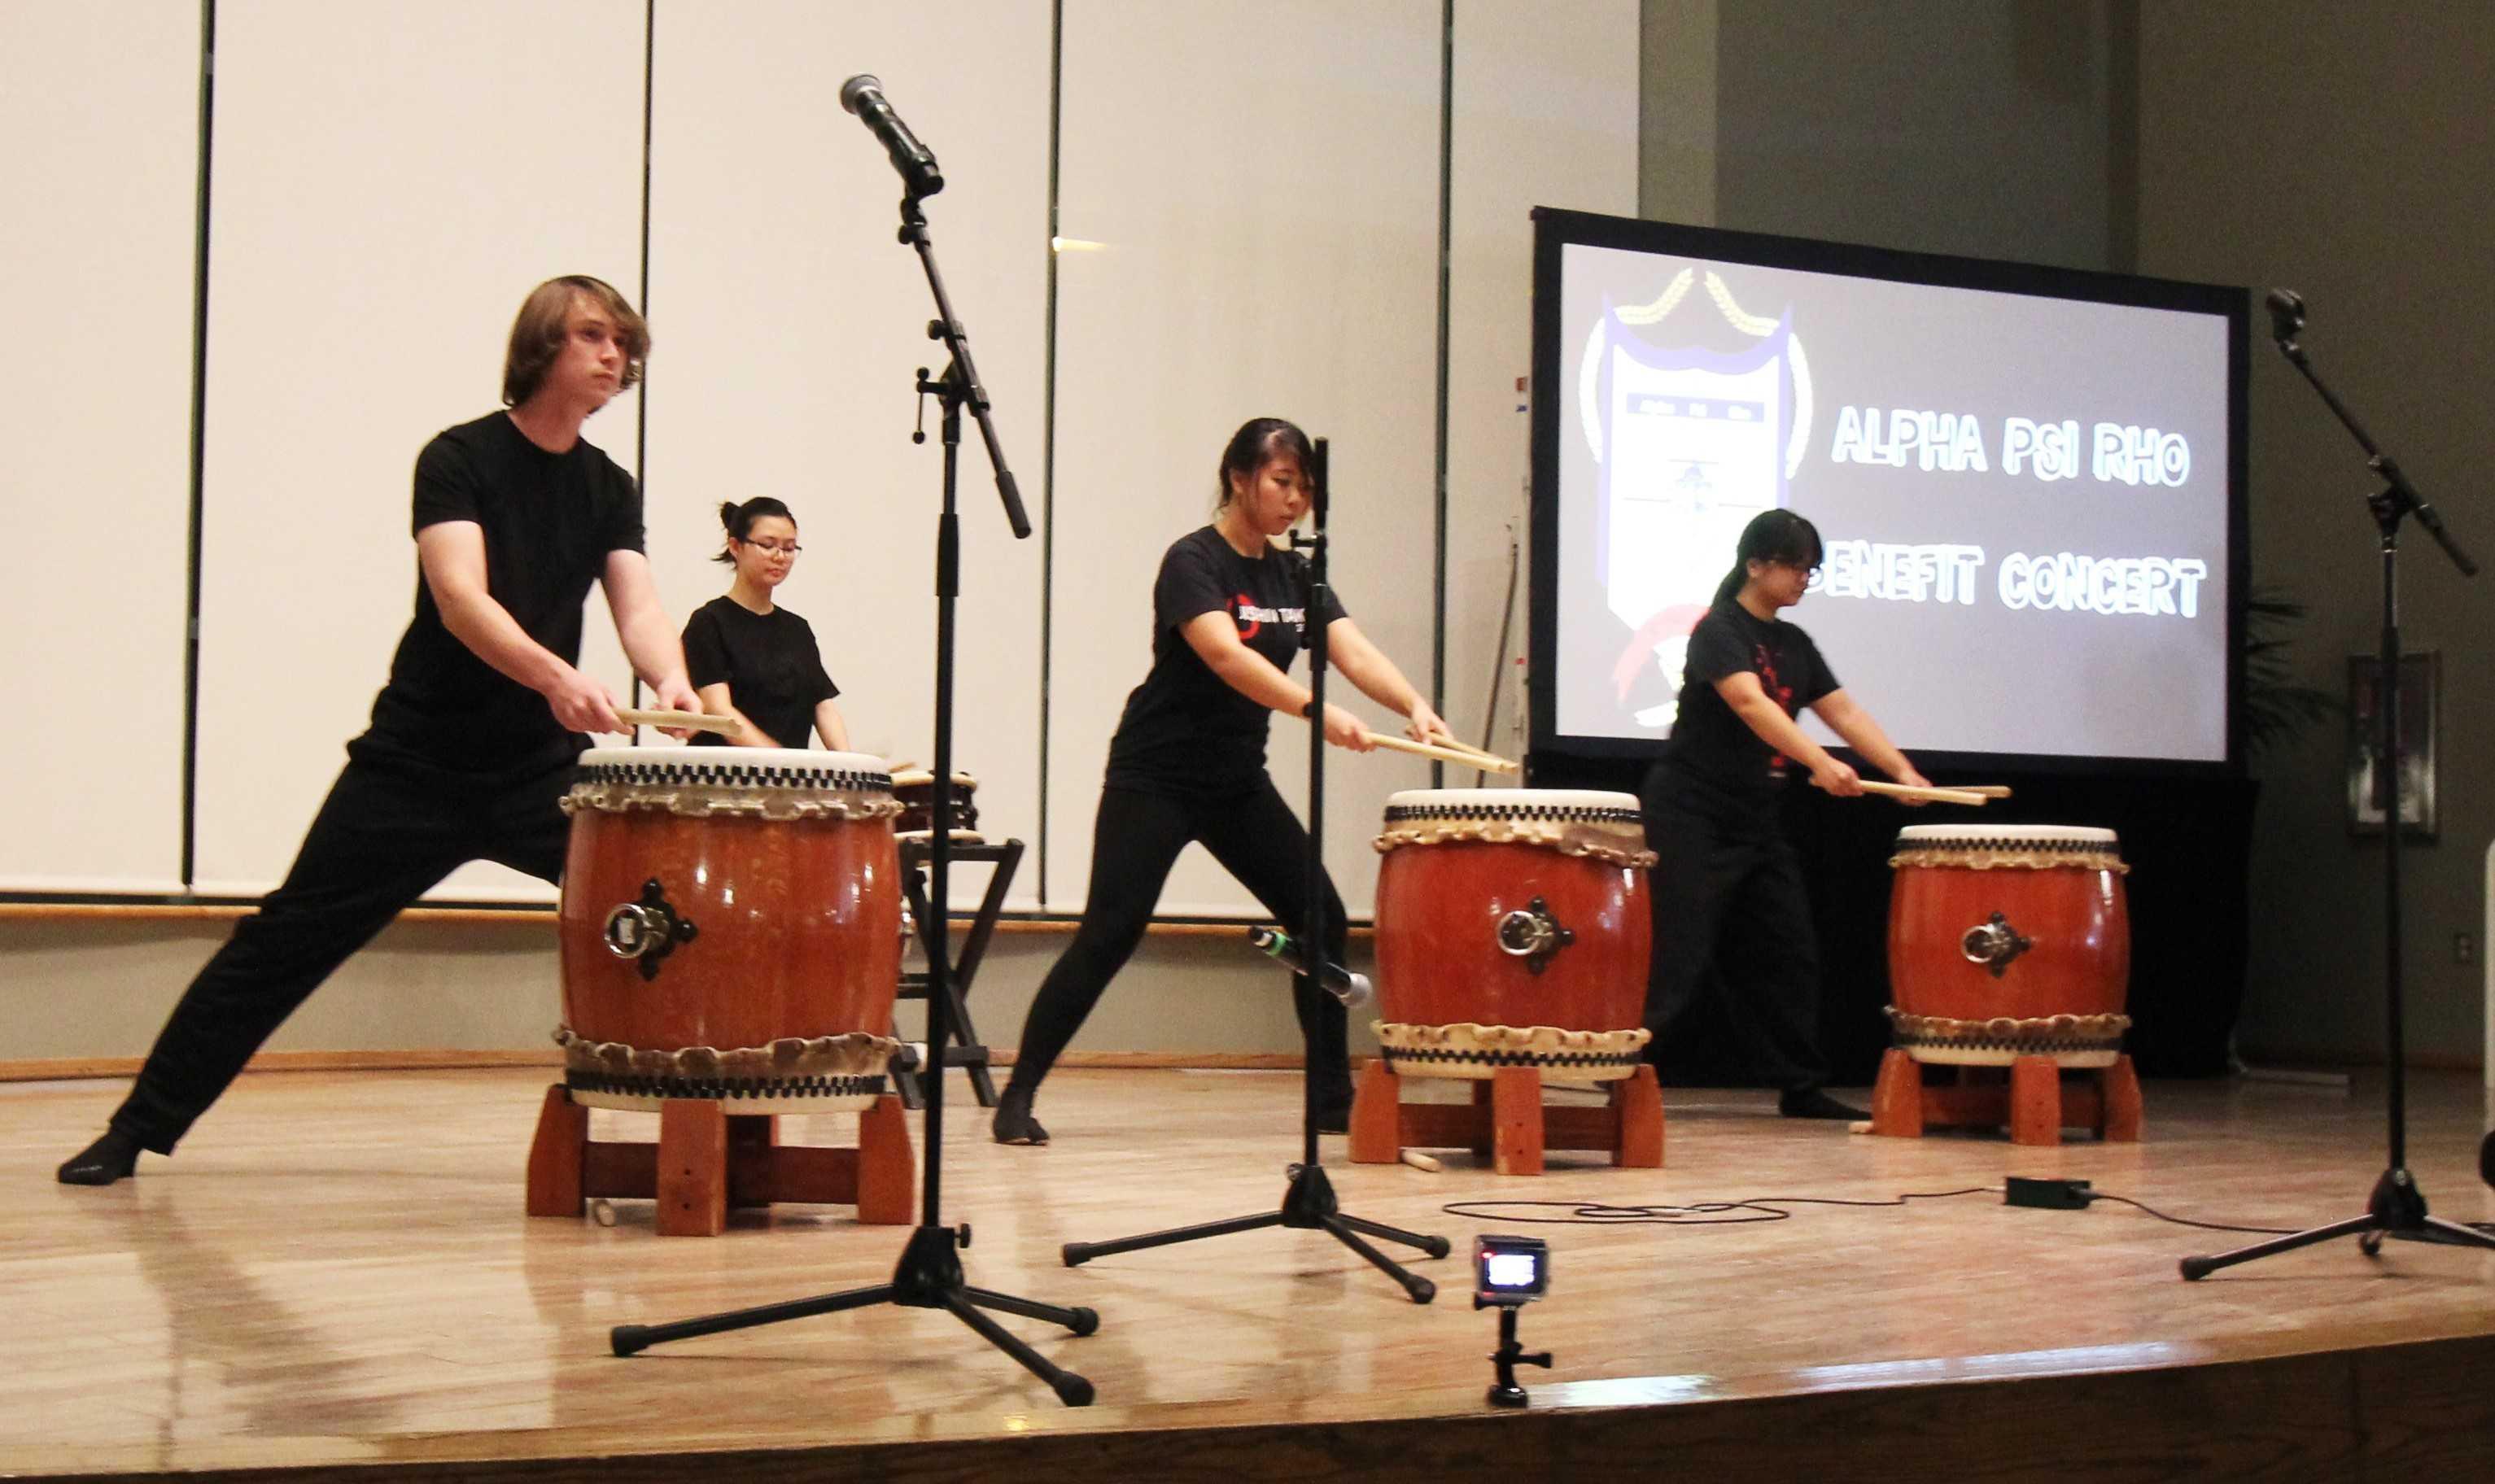 4+members+of+Jishin+Taiko+of+CSUN+play+the+drums